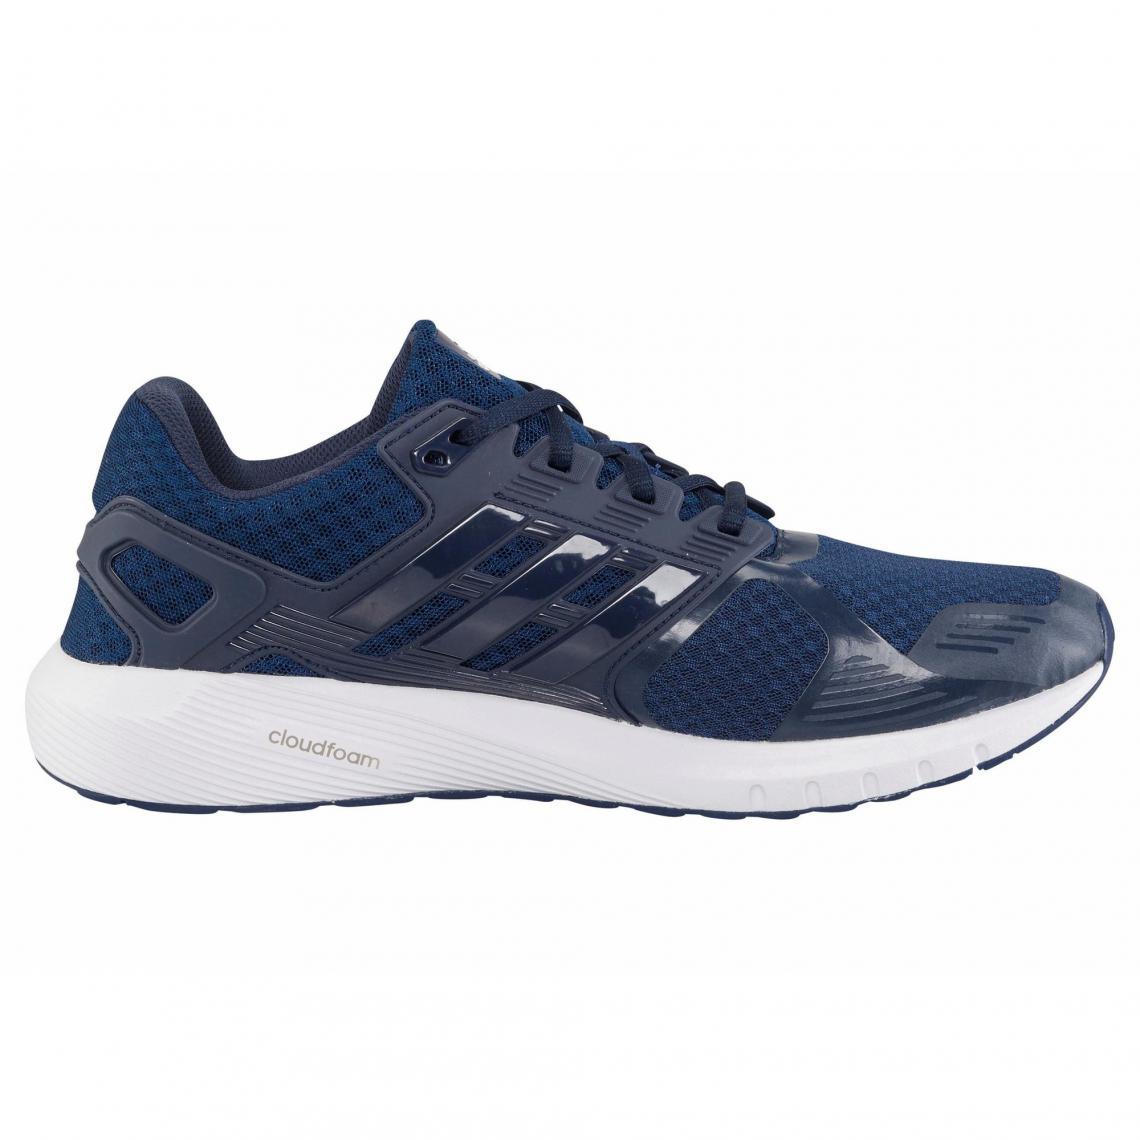 M Performance Trainer Chaussures Adidas Homme De 8 Duramo Course TaTwSq